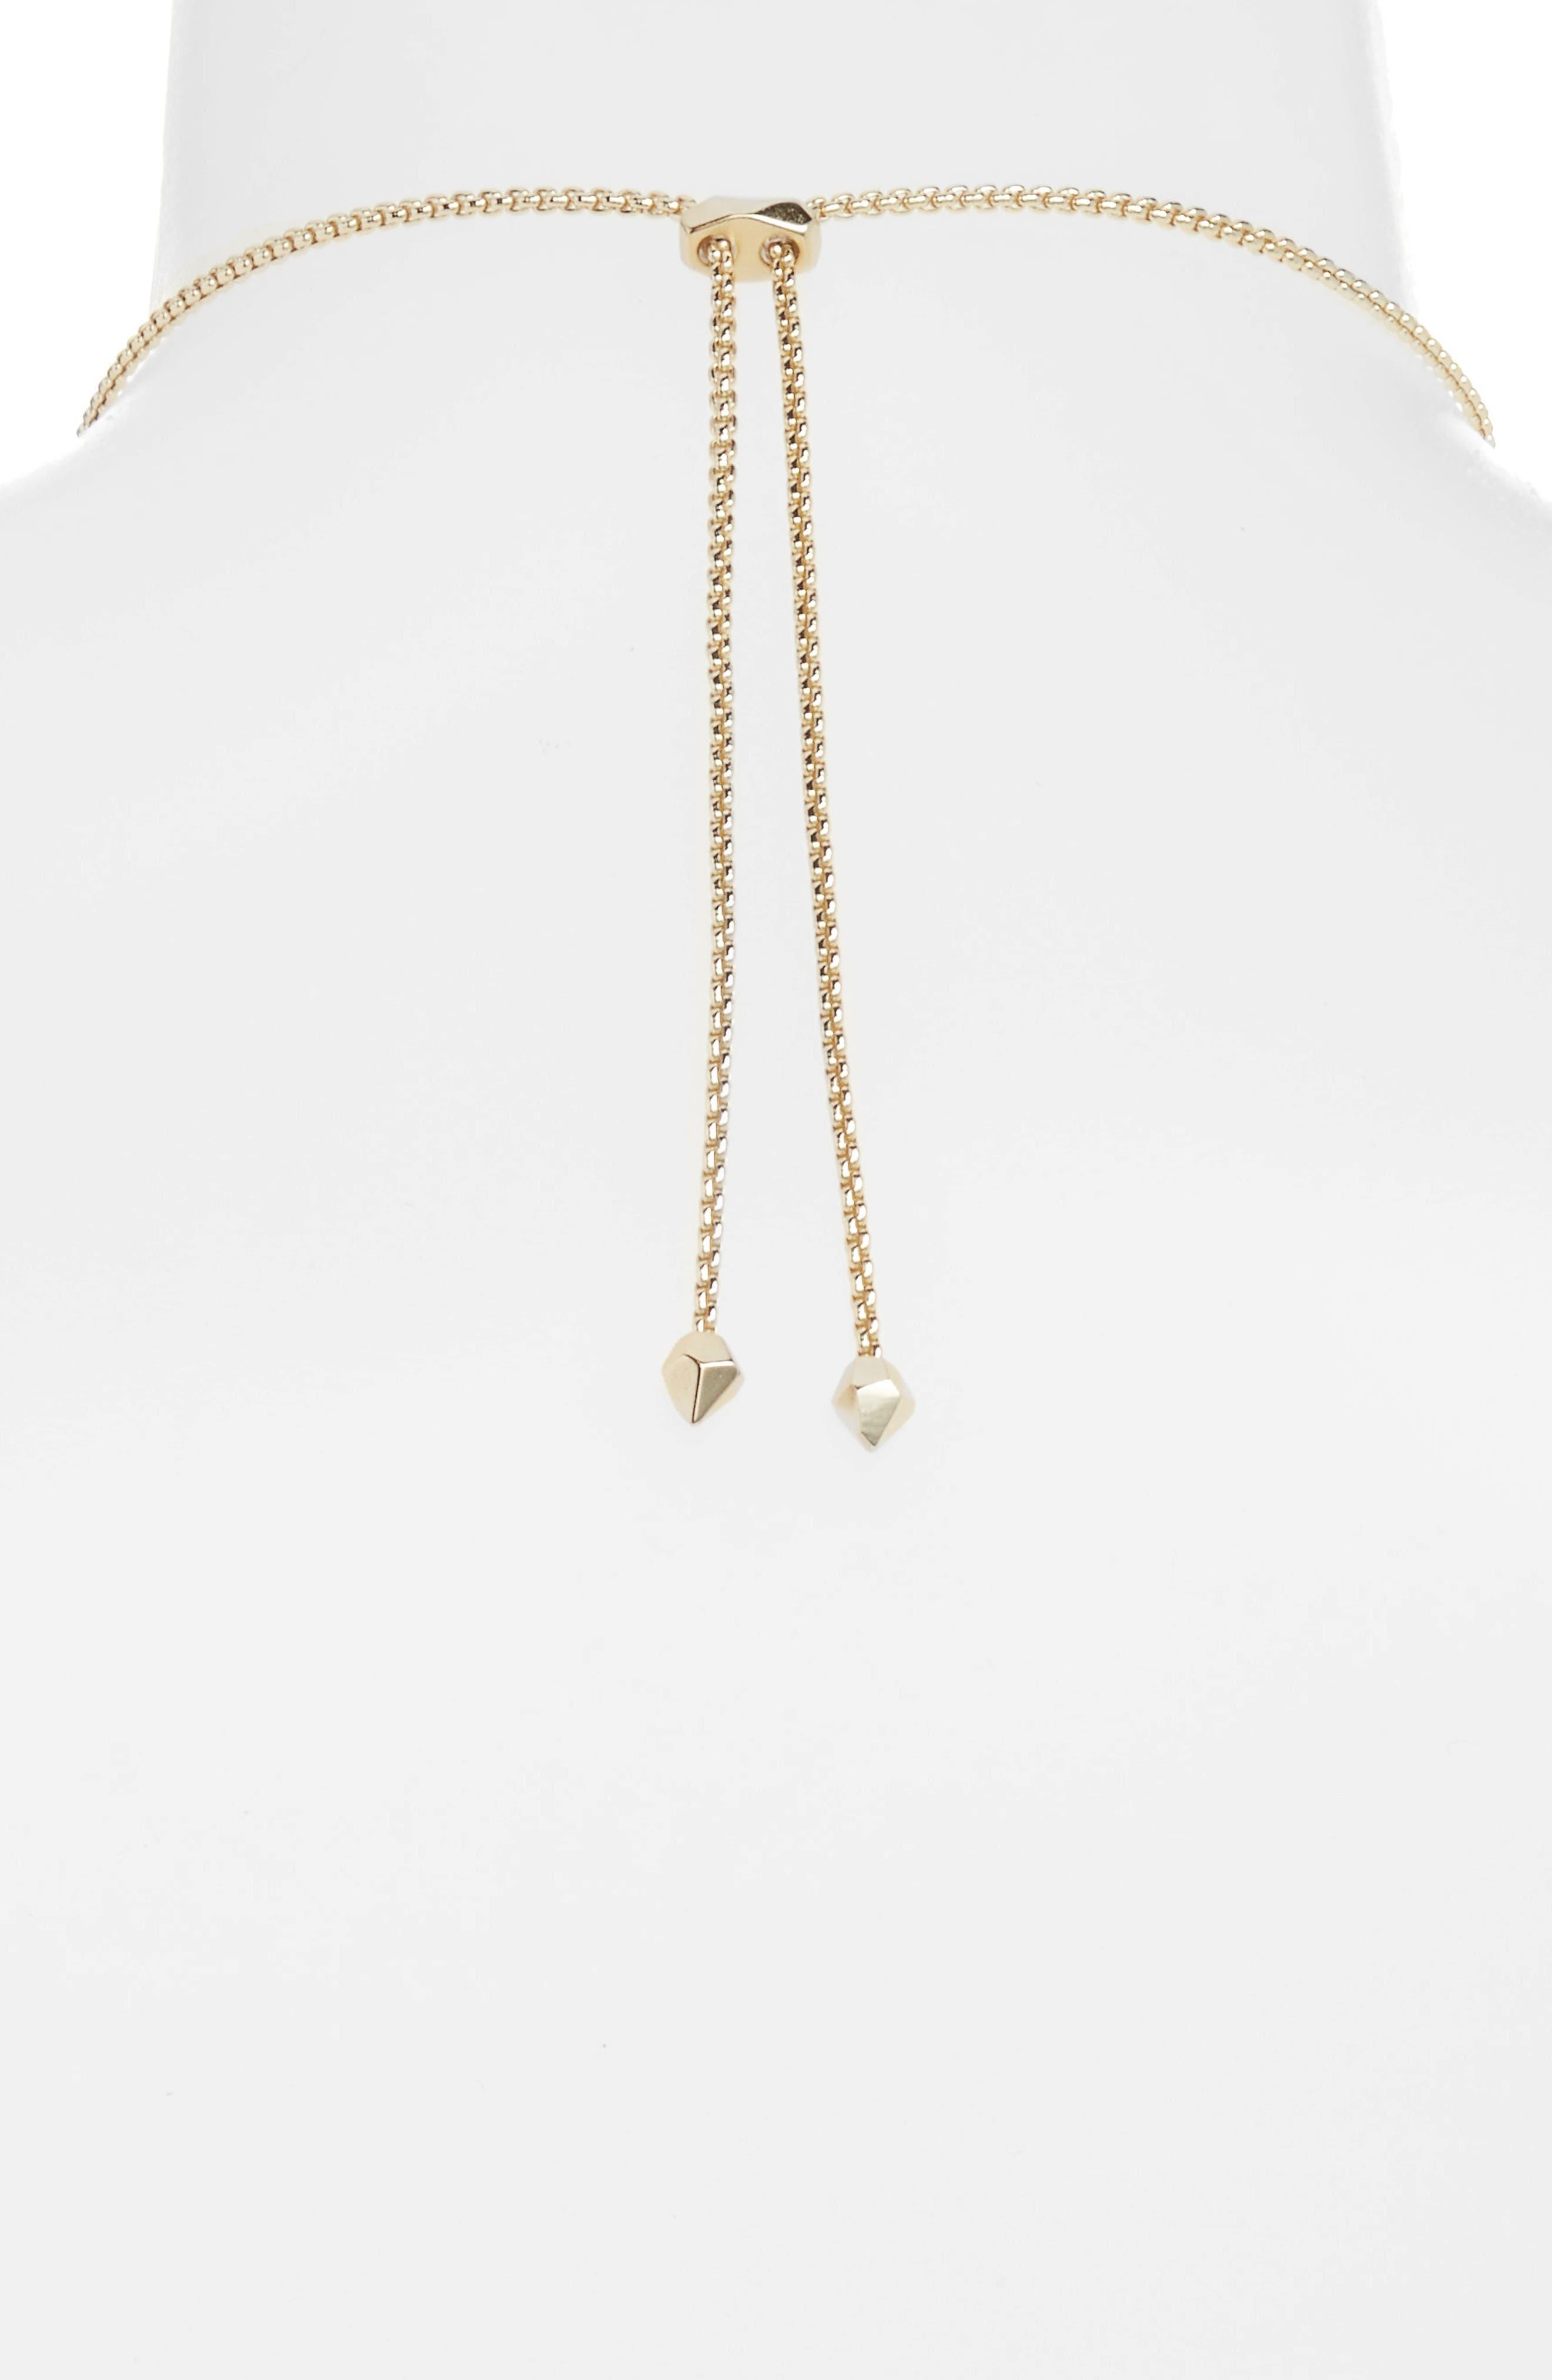 Harper Collar Necklace,                             Alternate thumbnail 2, color,                             White Cz/ Gold